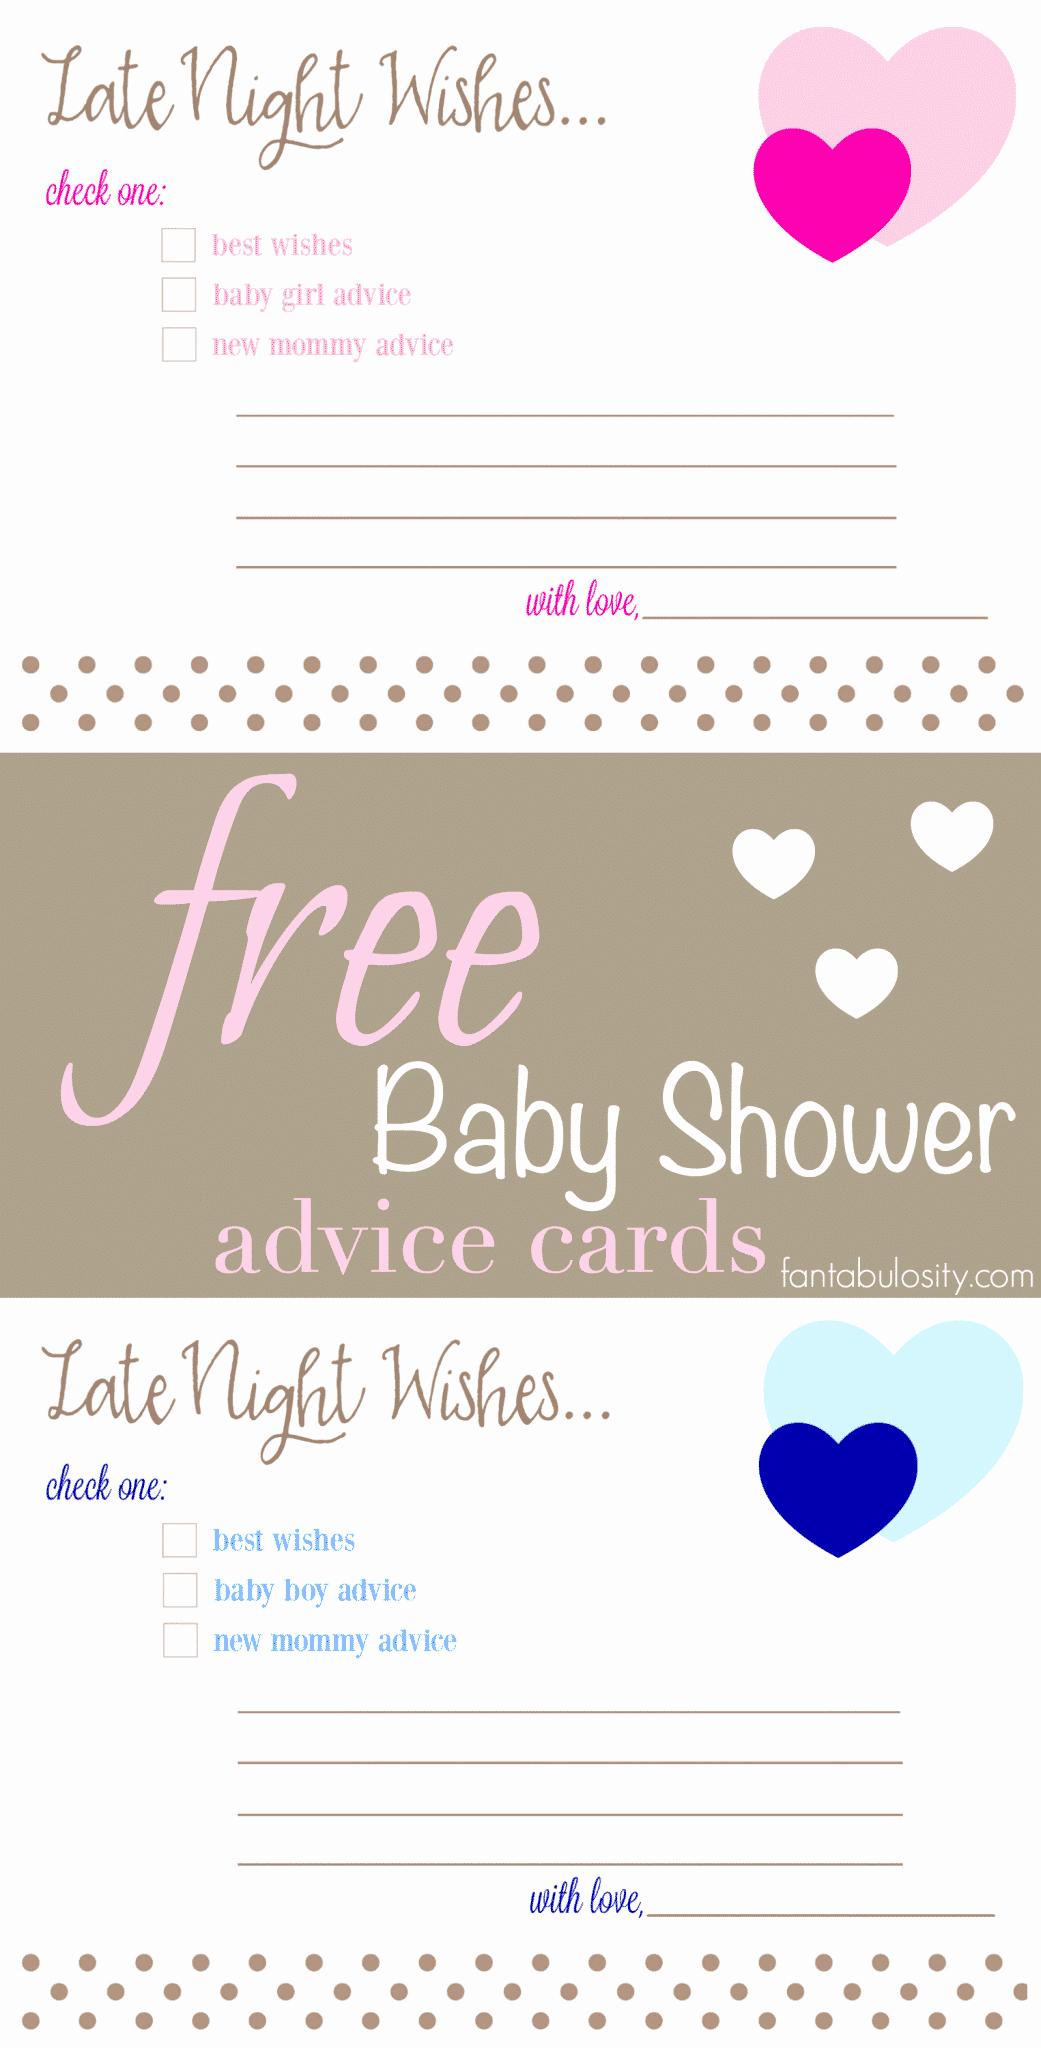 Free Printable Baby Shower Card Elegant Free Printable Baby Shower Advice & Best Wishes Cards